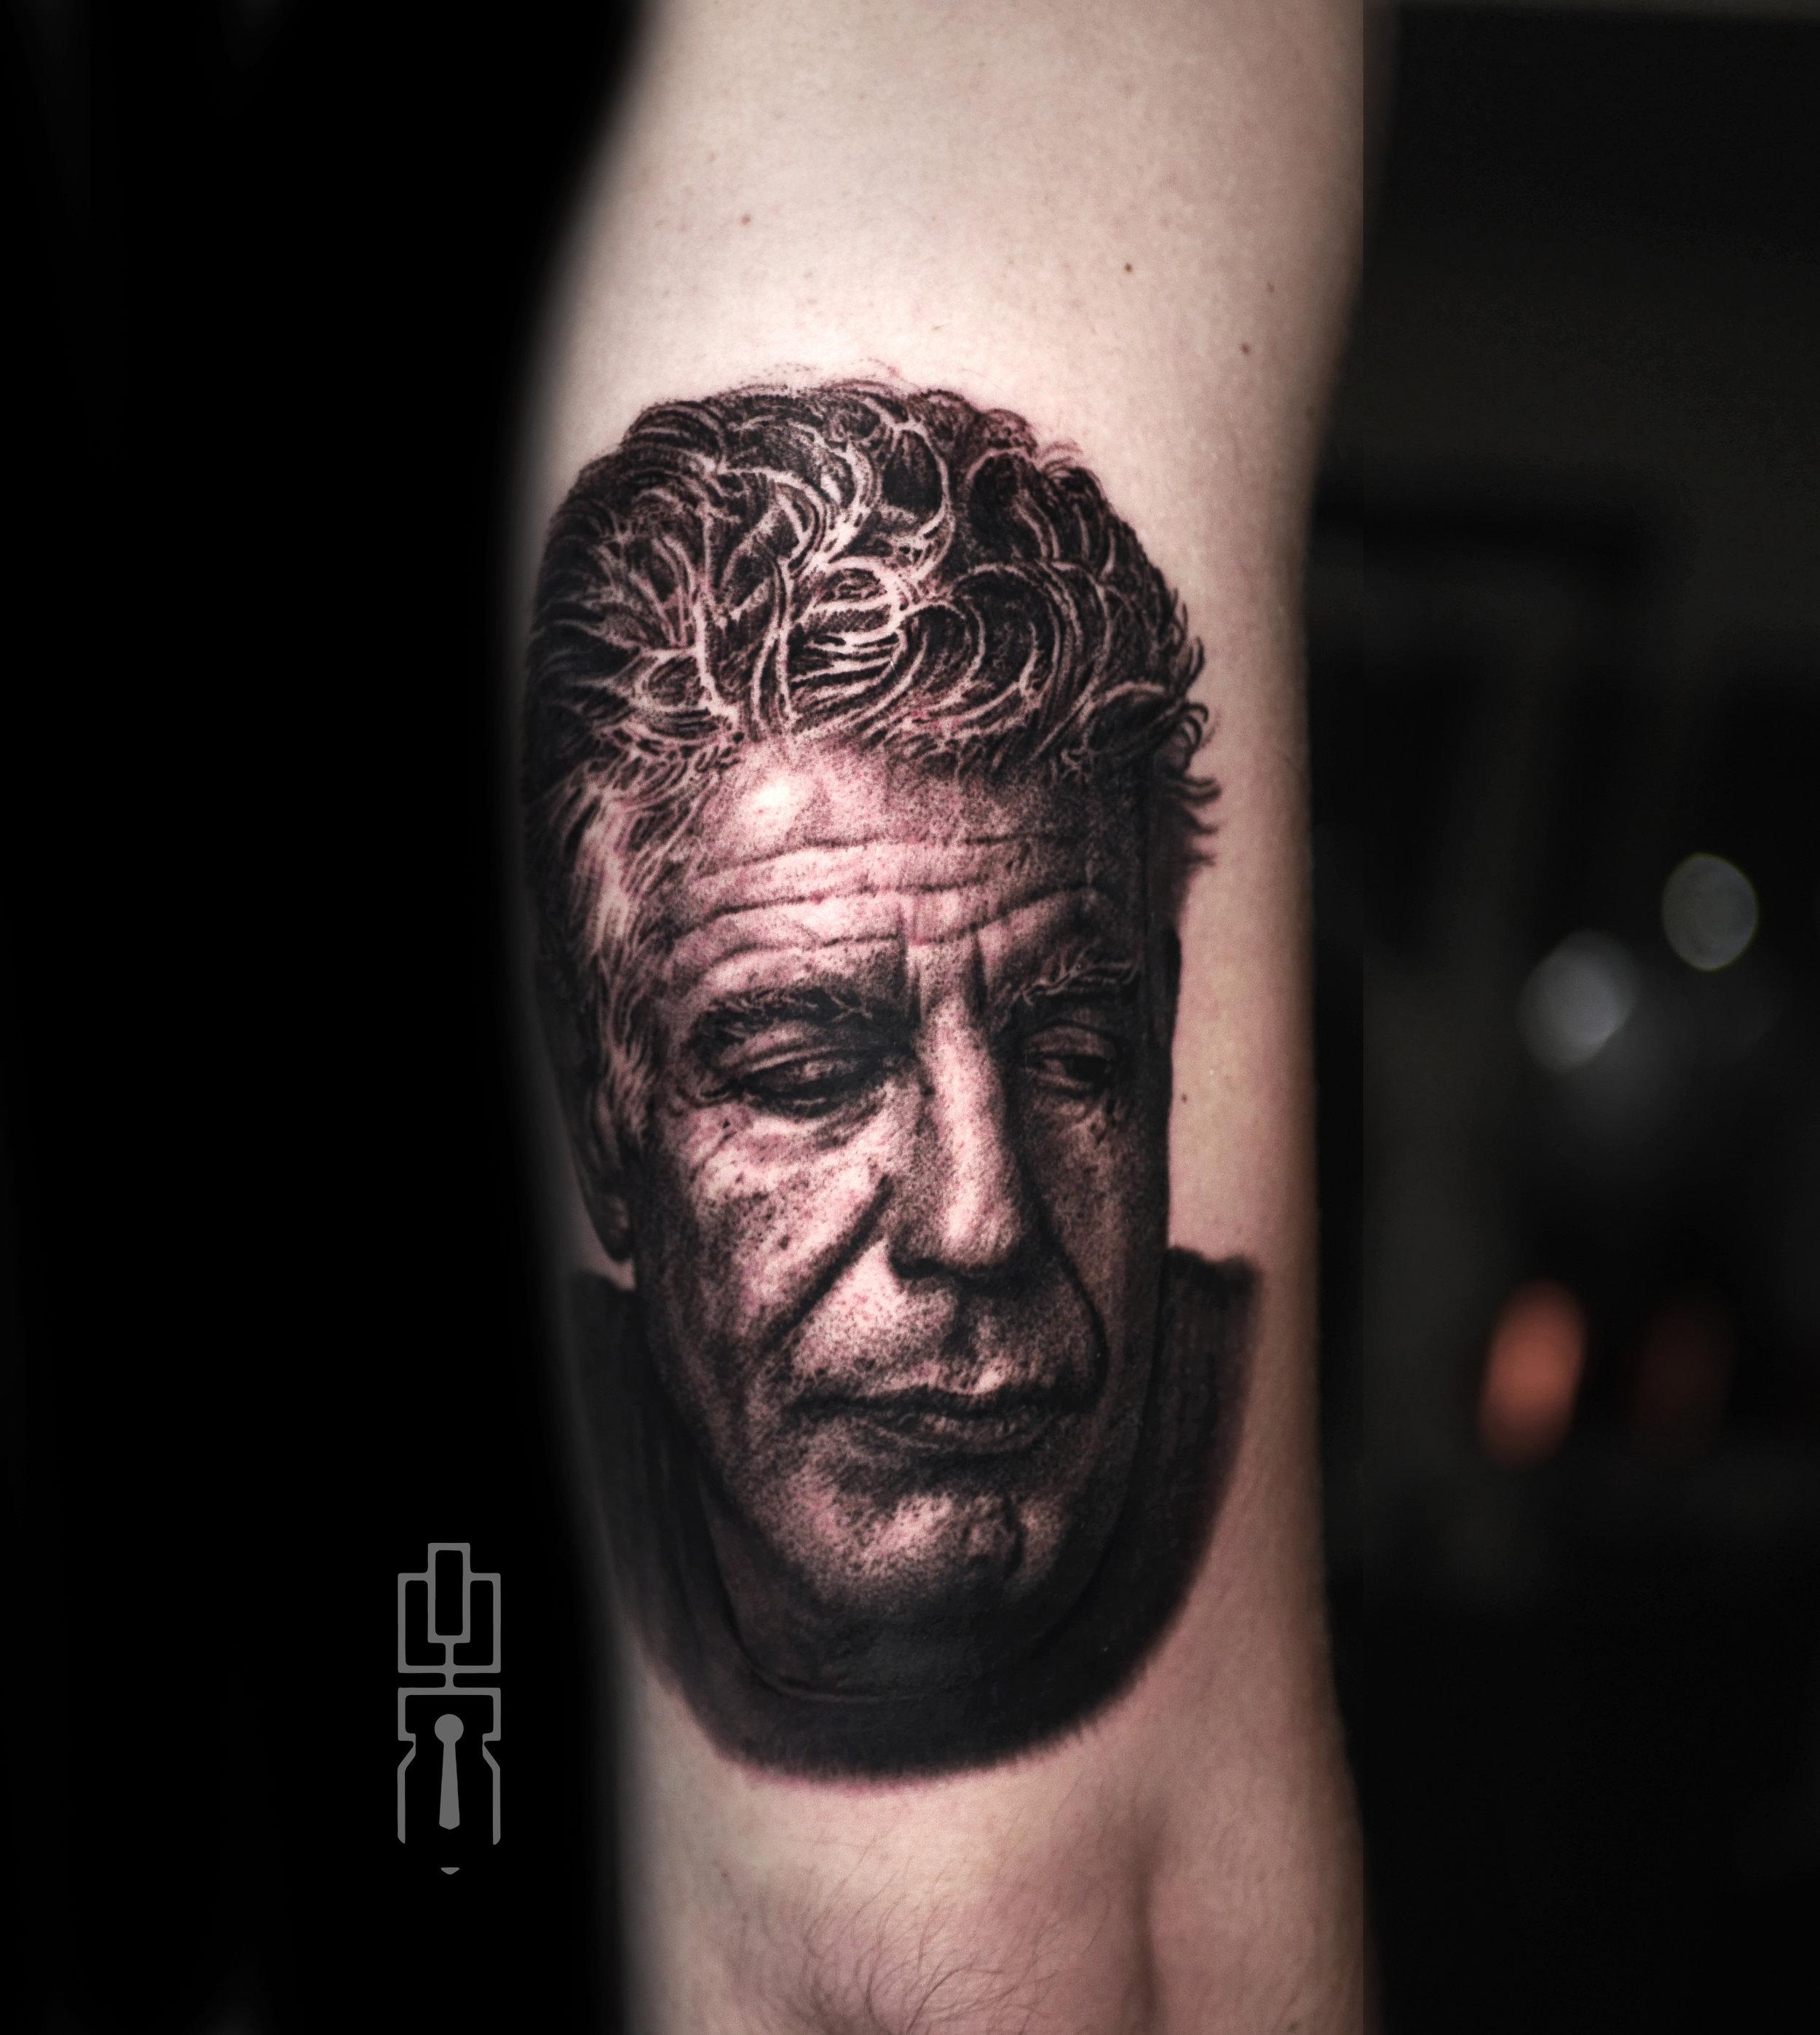 anthony bourdain portrait tattoo.jpg